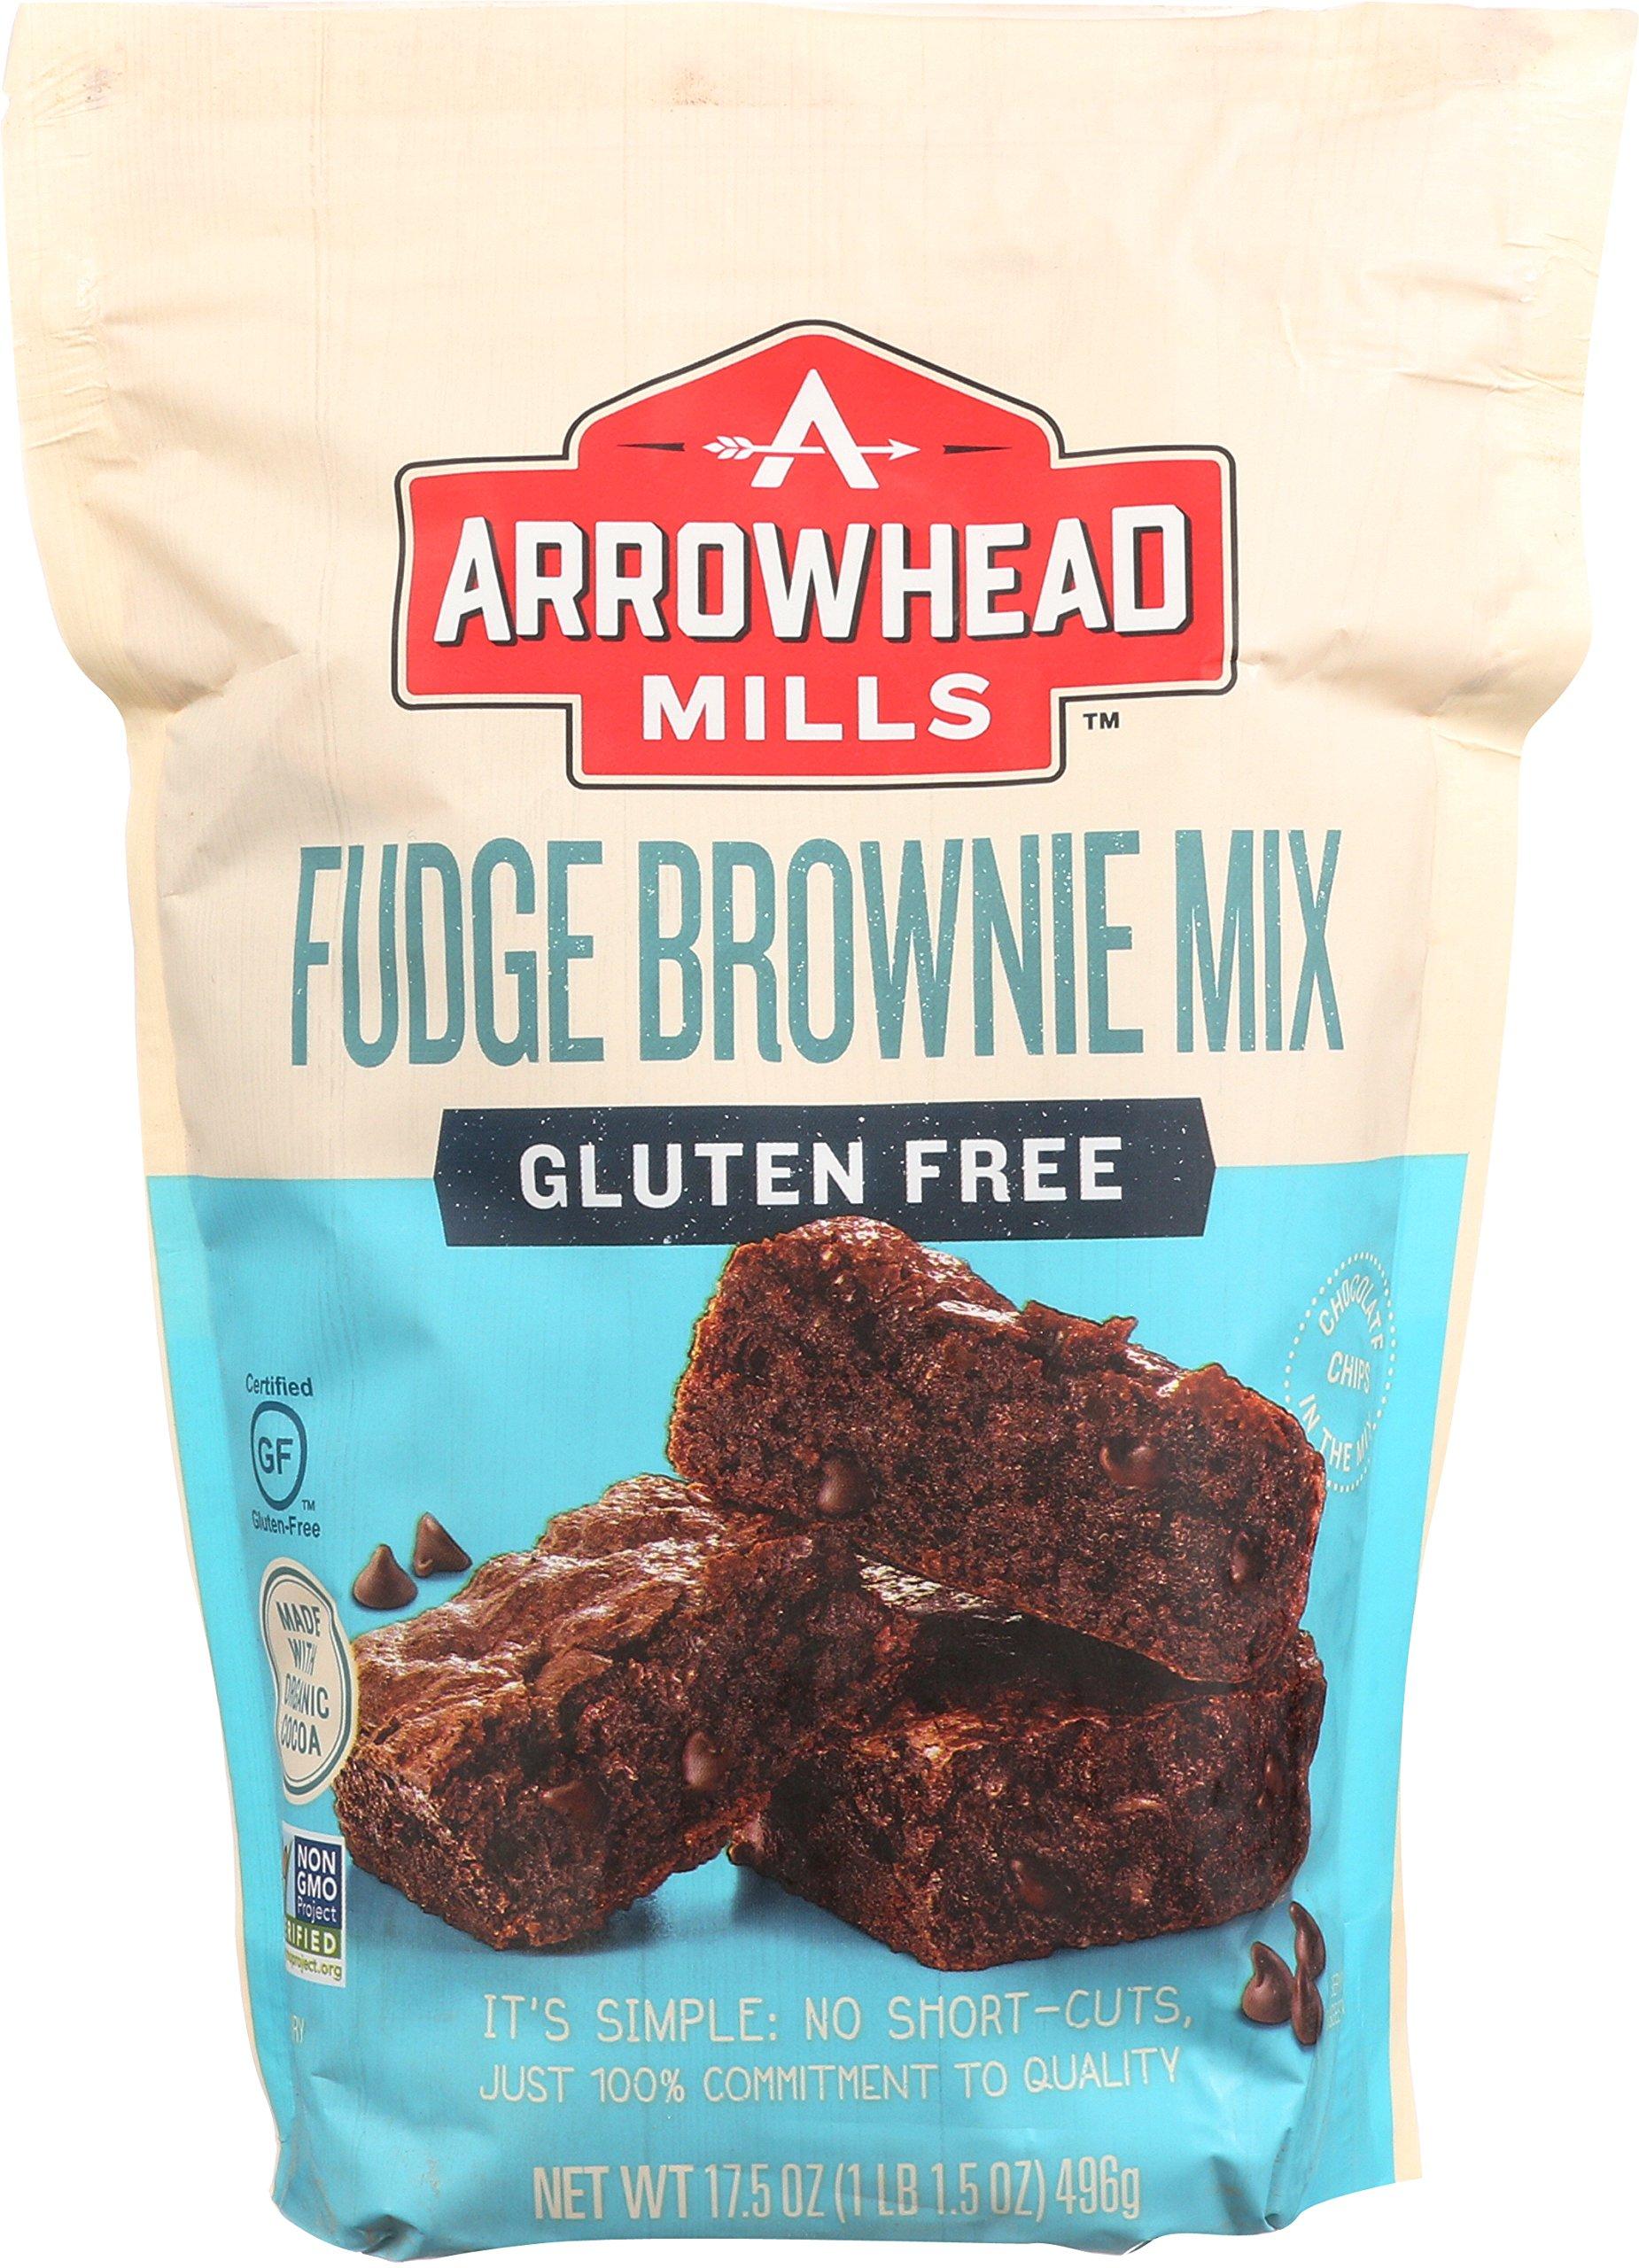 Arrowhead Mills Gluten-Free Fudge Brownie Mix, 17.5 oz. (Pack of 6) by Arrowhead Mills